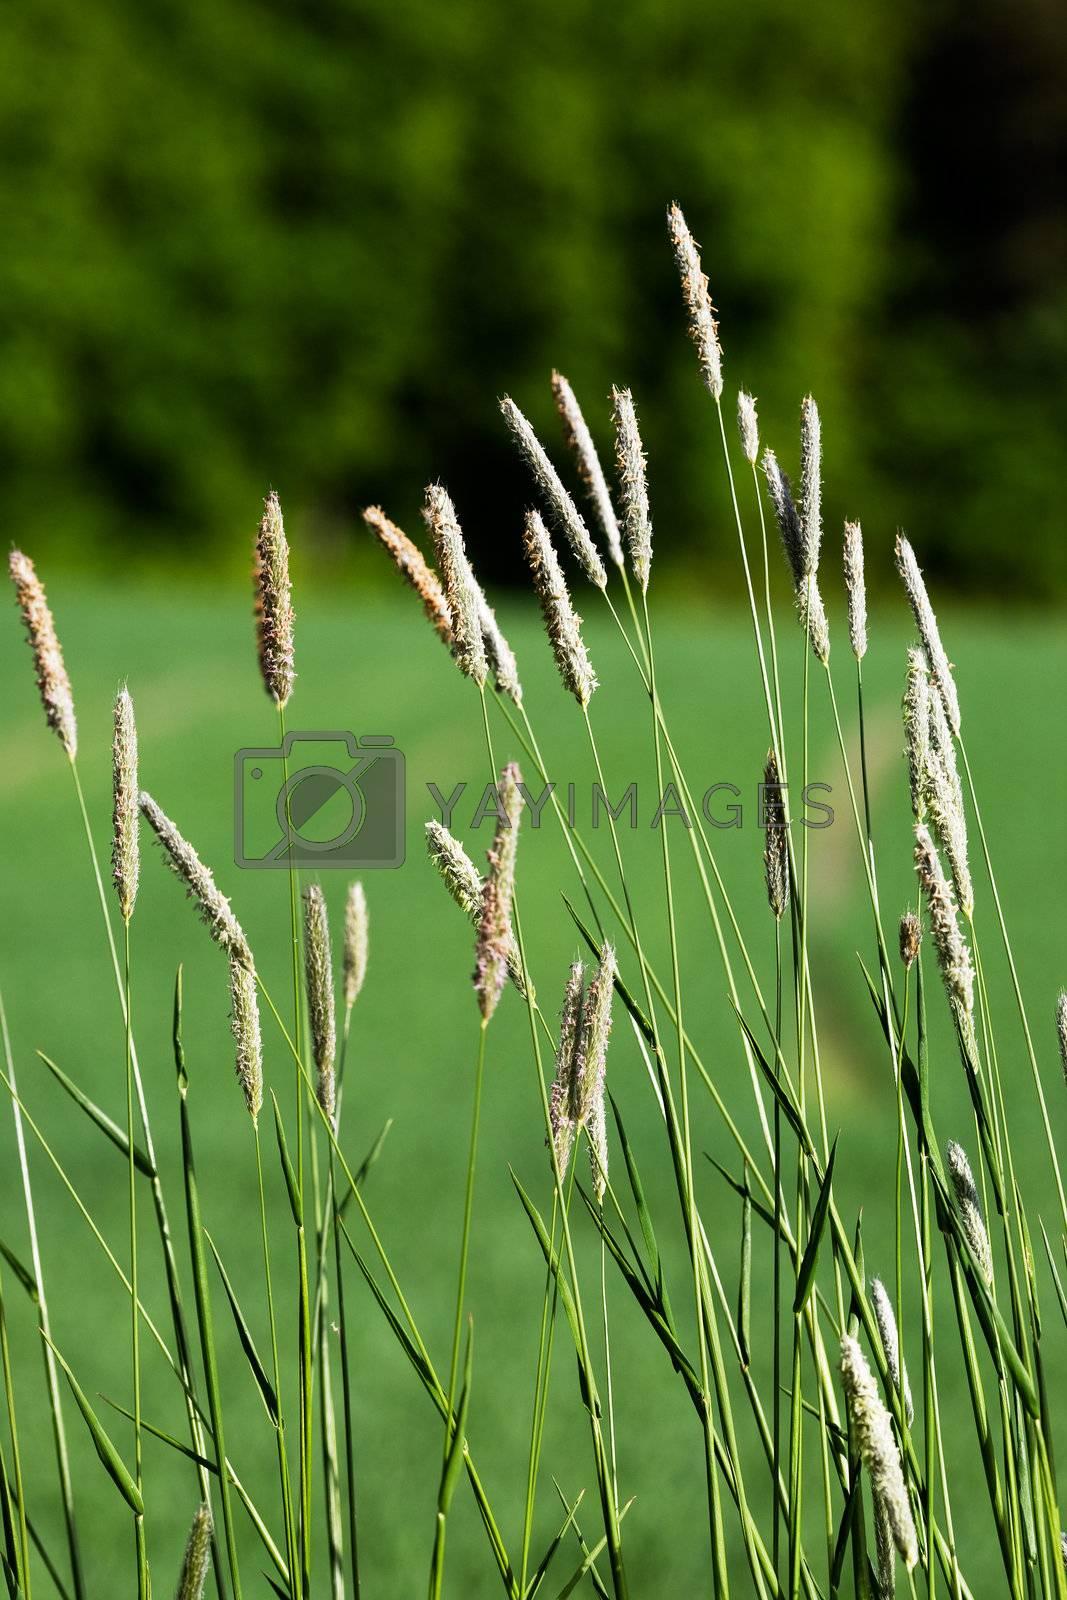 Wild grass on a green background - Timothy-grass (Phleum pratense)